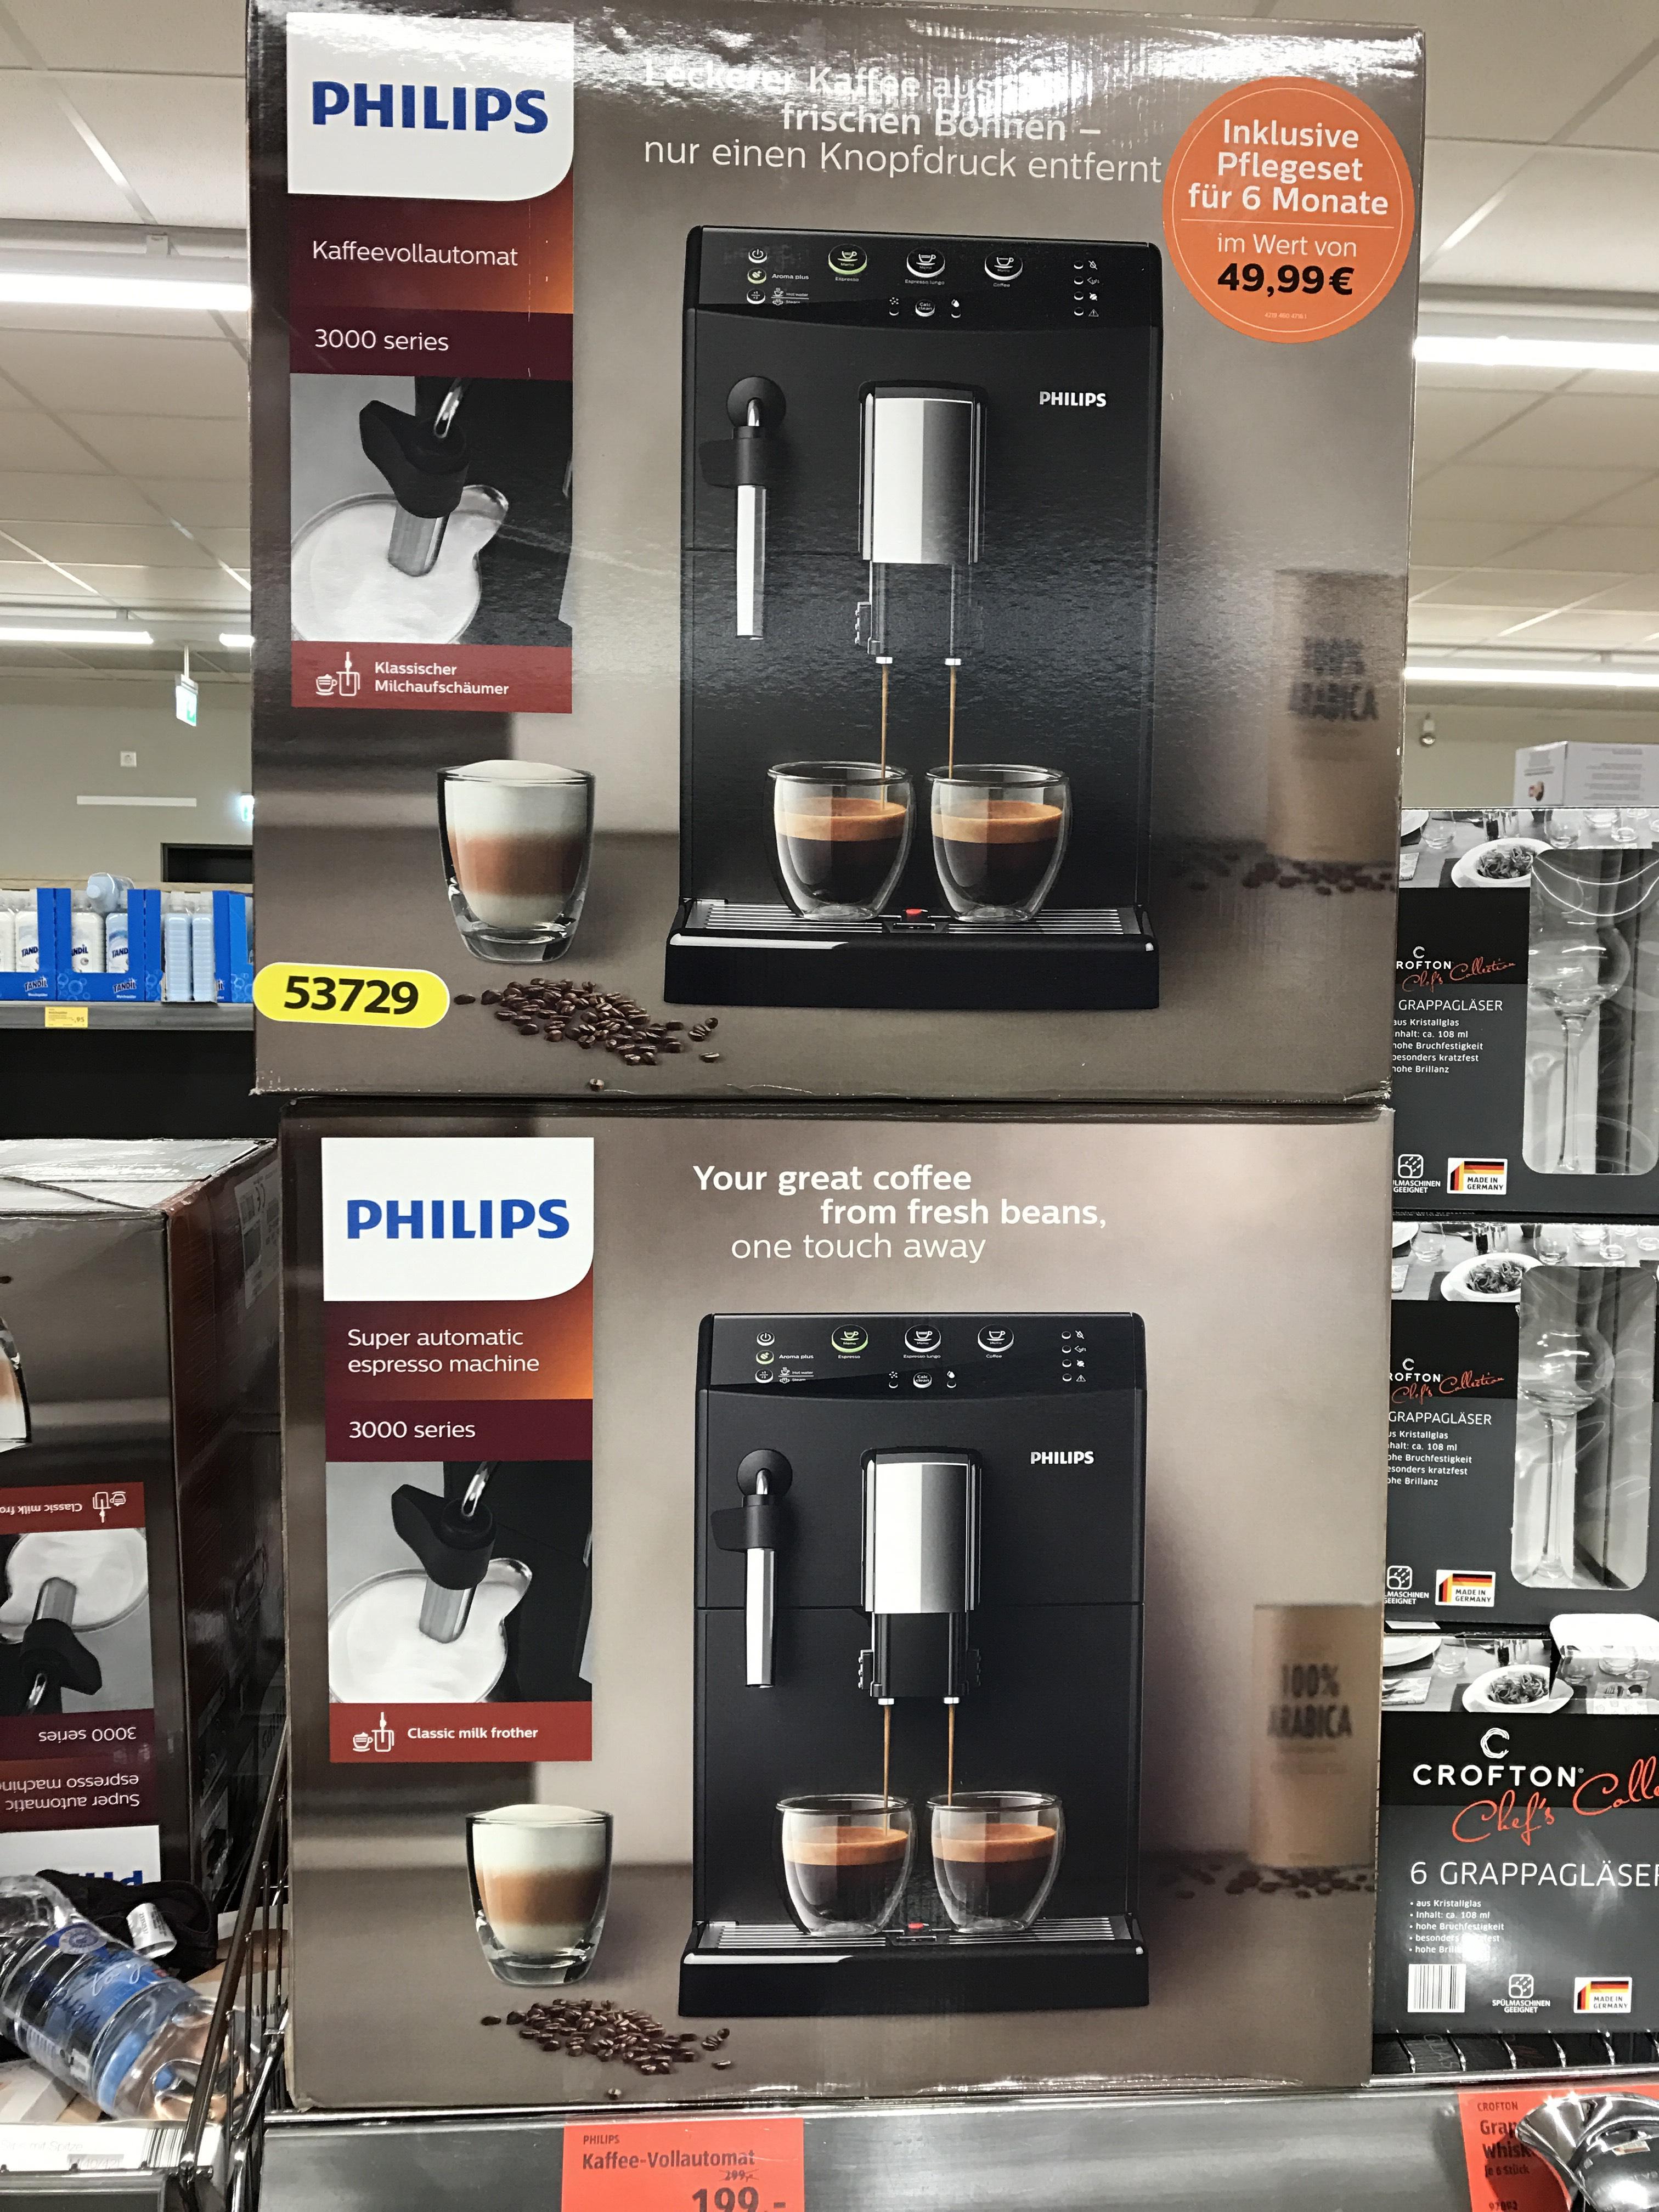 Philips Kaffeevollautomat 3000 Series bei Aldi Süd Sindelfingen